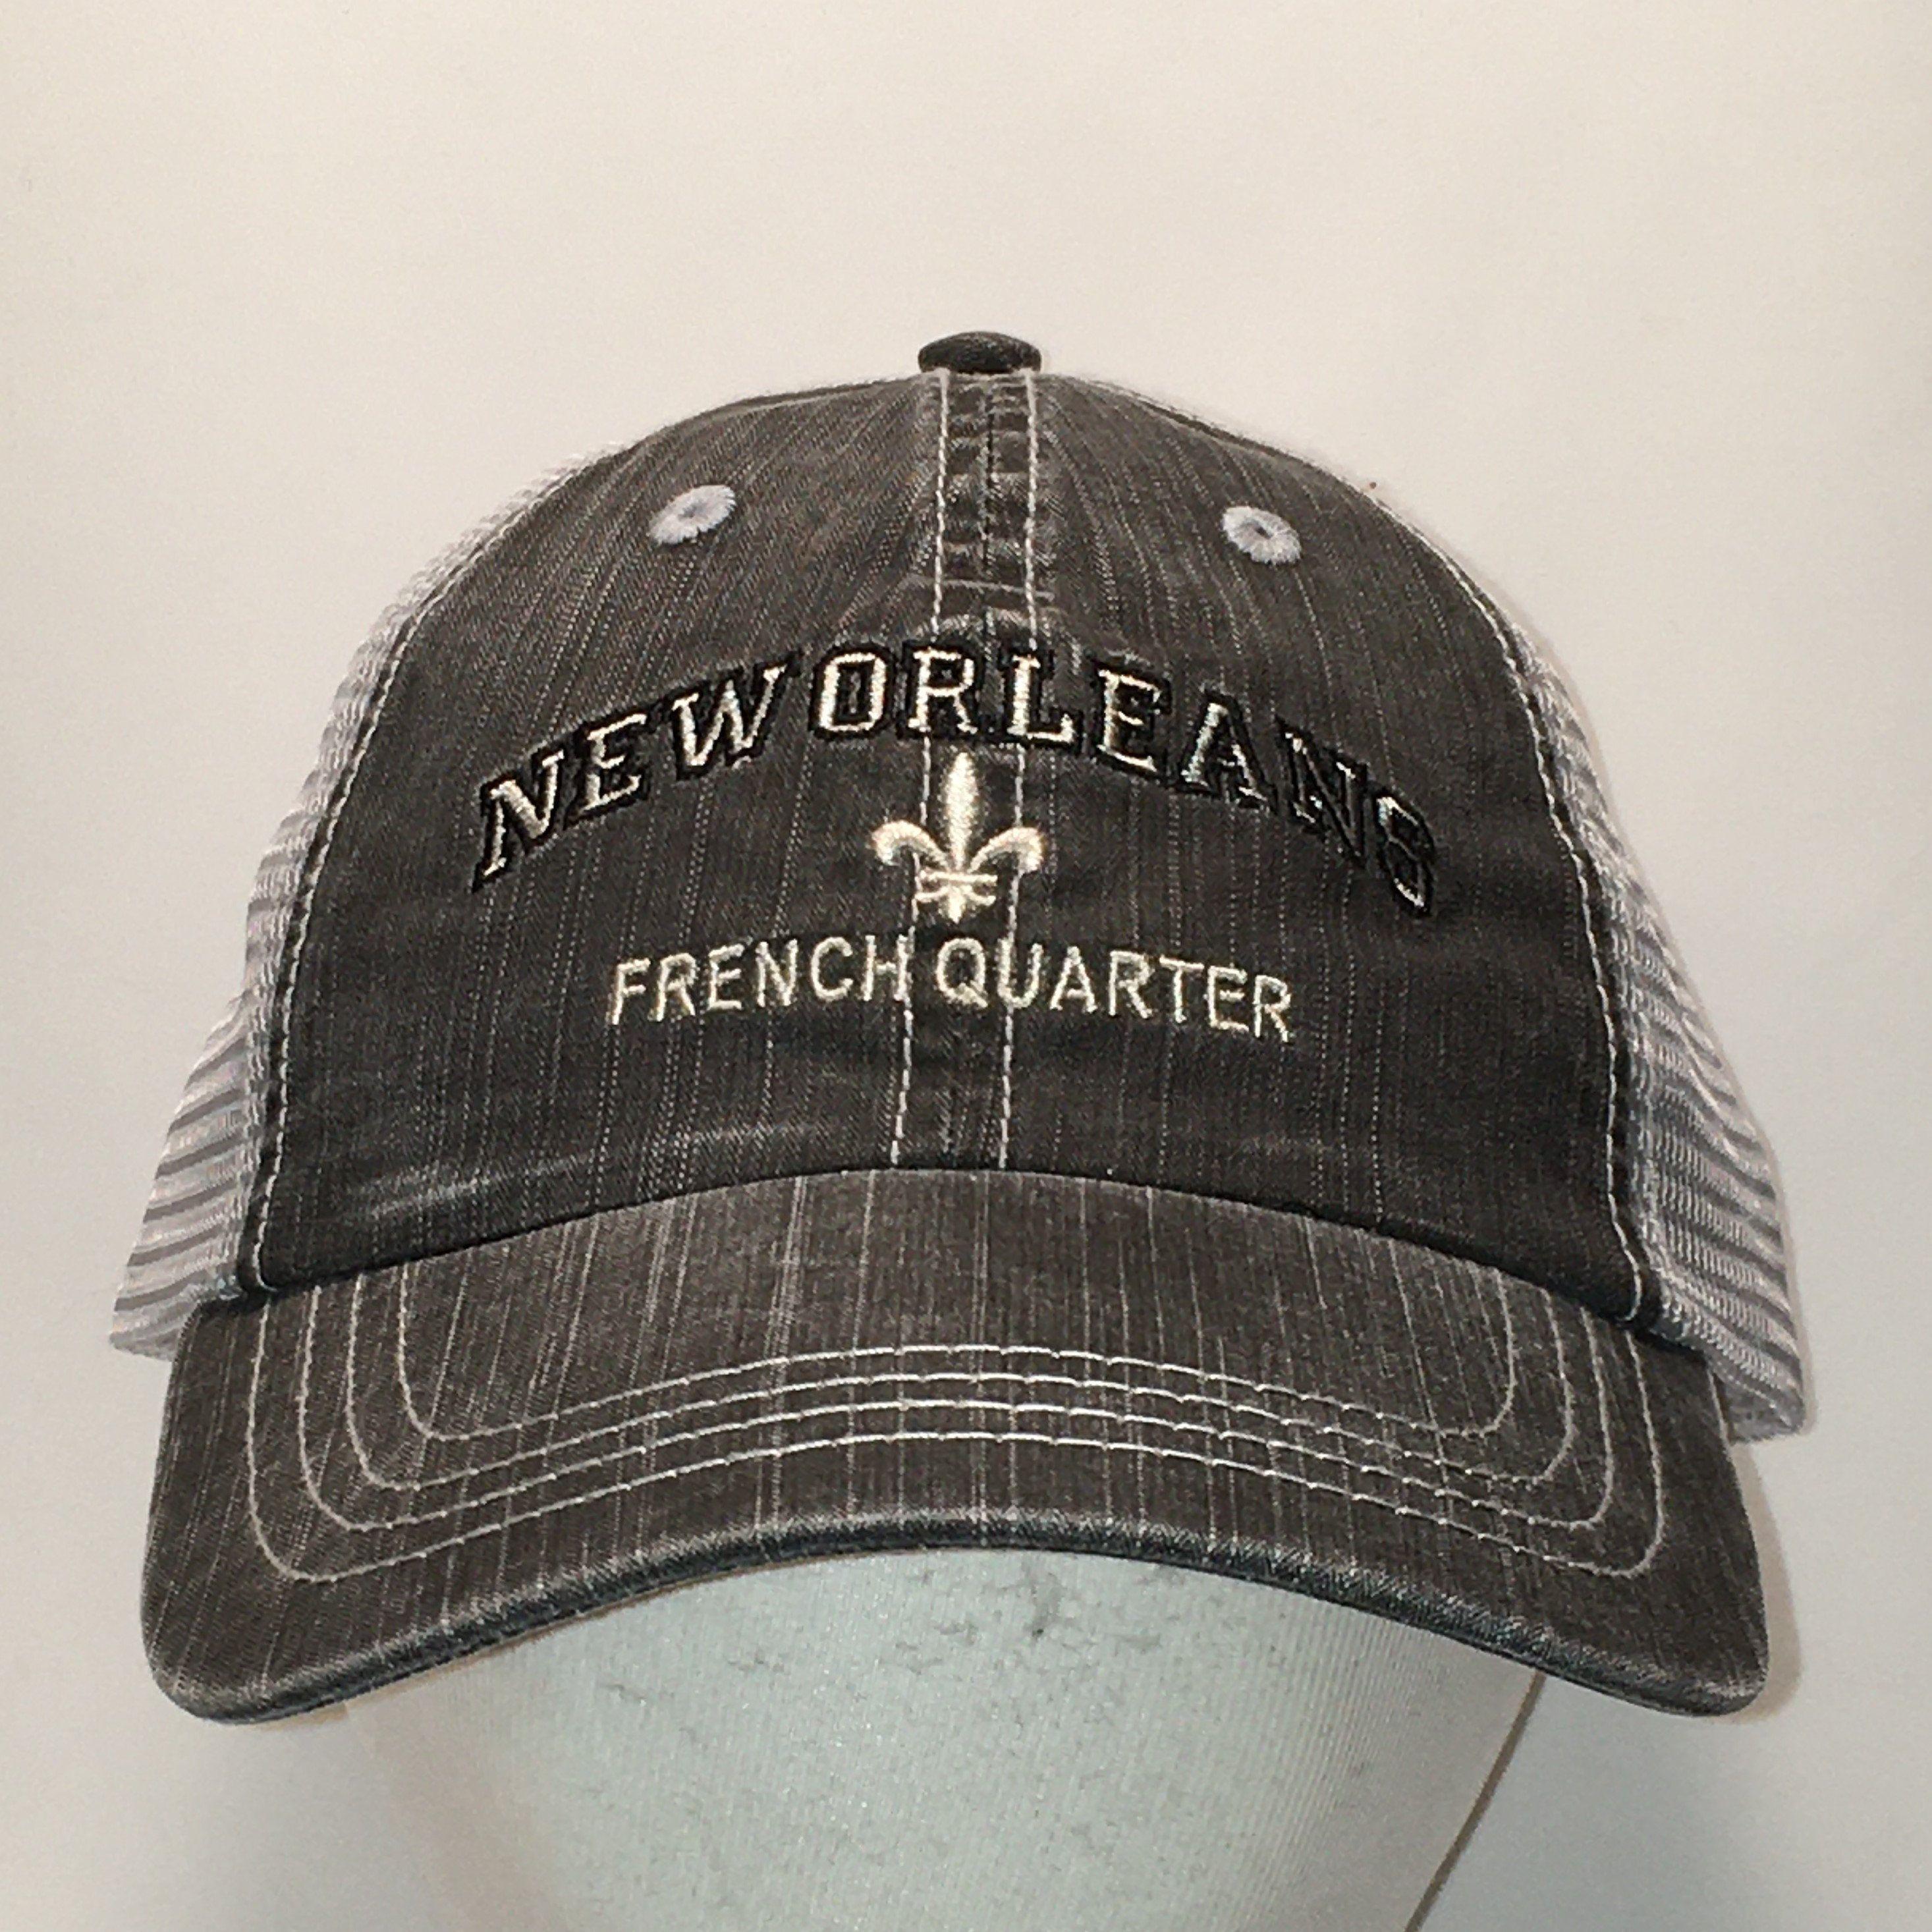 Vintage New Orleans Hat French Quarter Baseball Cap Dad Hats Etsy Hats For Men Best Gifts For Men Dad Hats